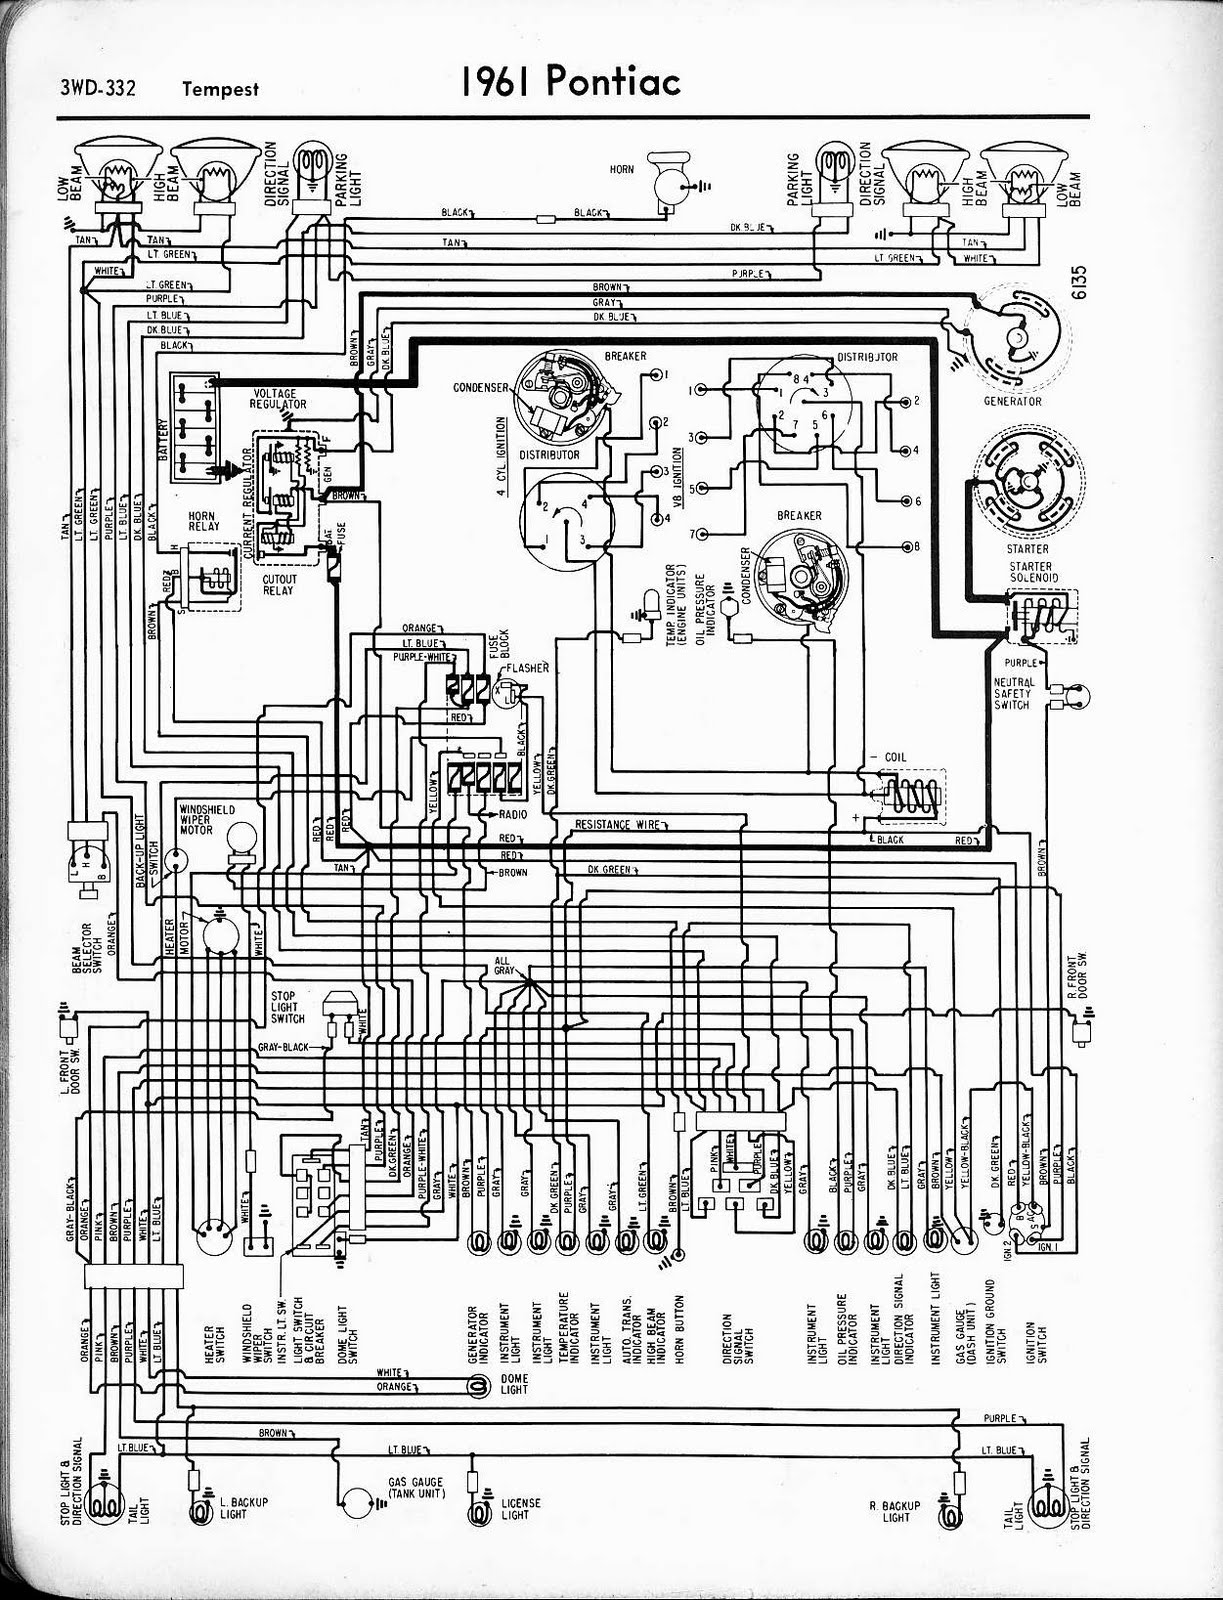 free auto wiring diagram 1961 pontiac tempest wiring diagram 2003 silverado fog light wiring harness 2009 [ 1223 x 1600 Pixel ]